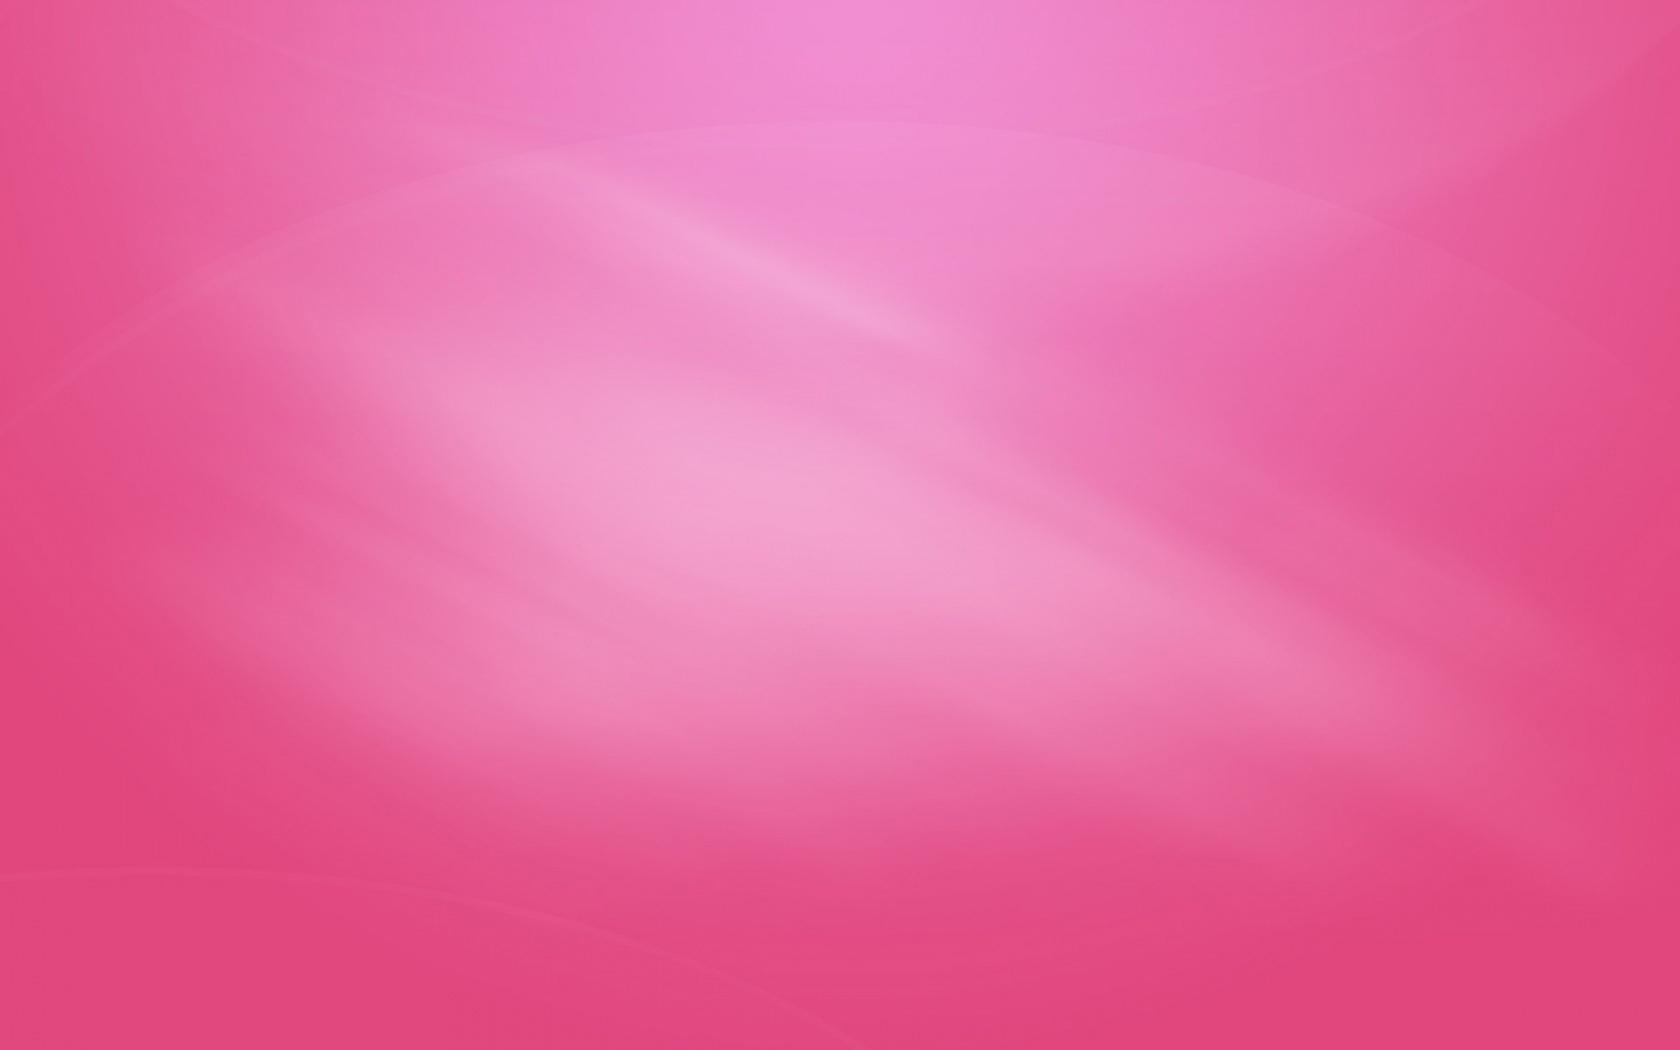 Pink computer background   Windows 7 Wallpaper 26875529 1680x1050